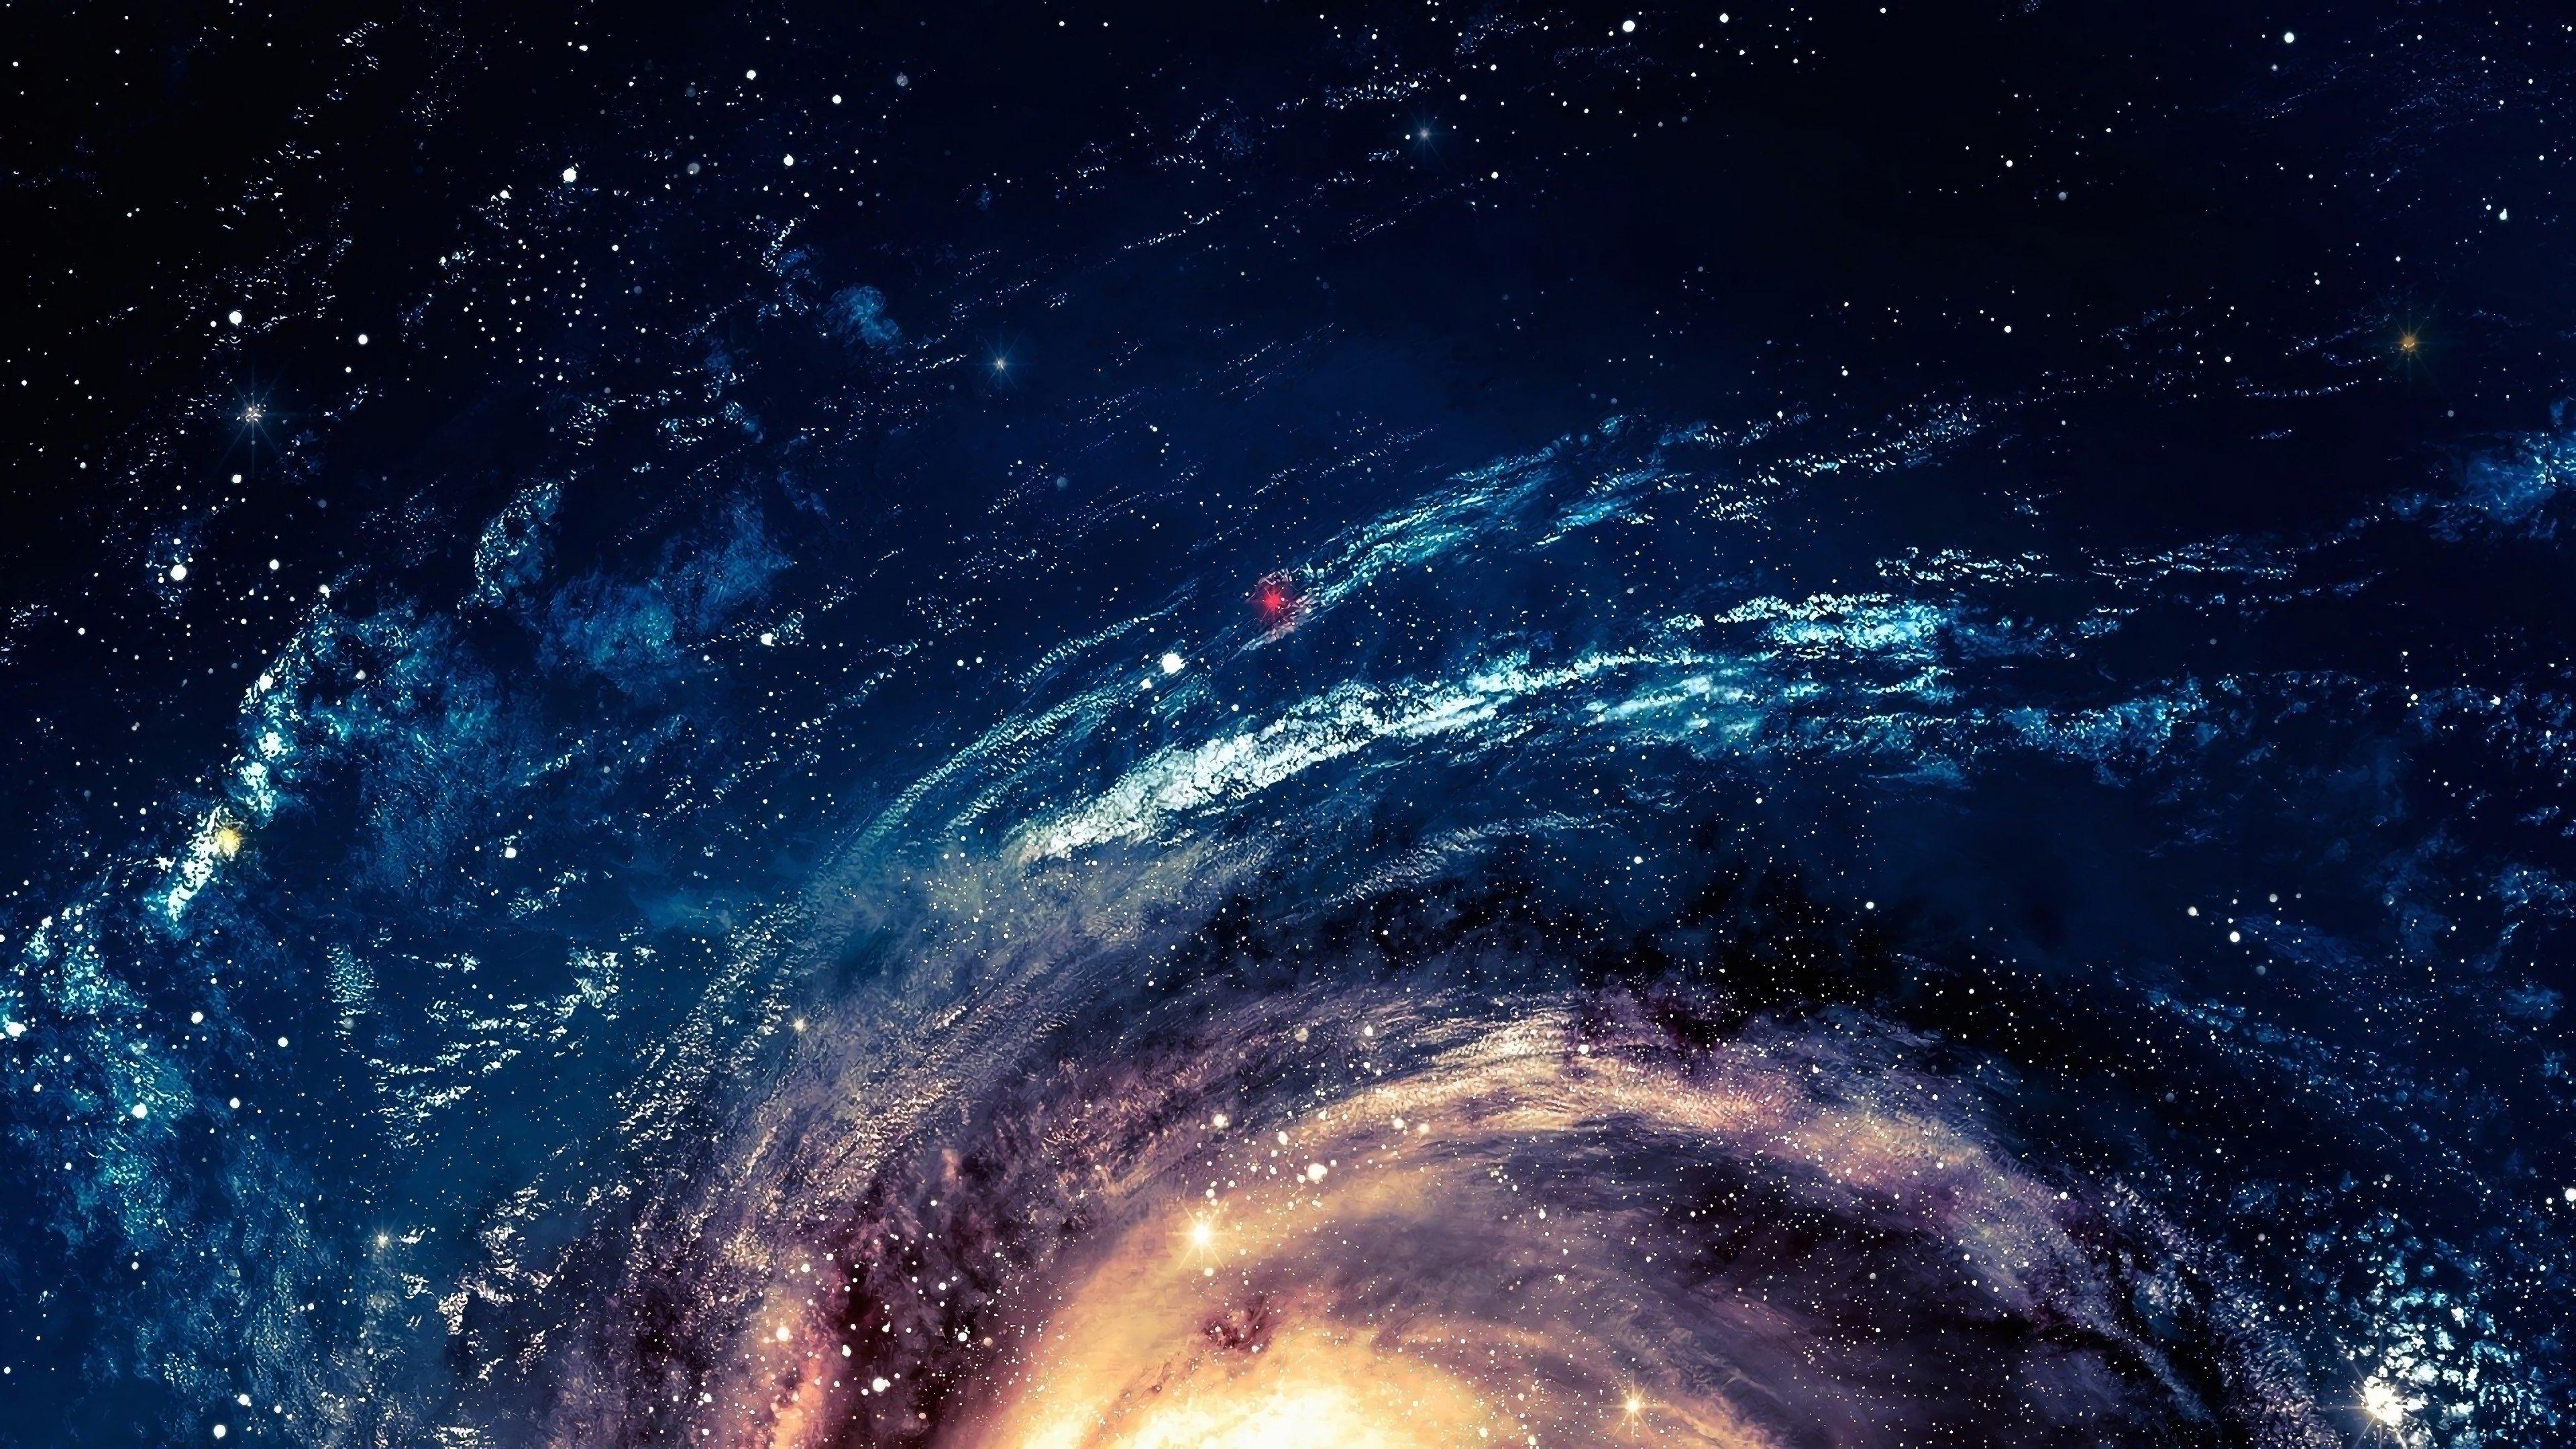 Fondos de pantalla Diseño de galaxia abstracta